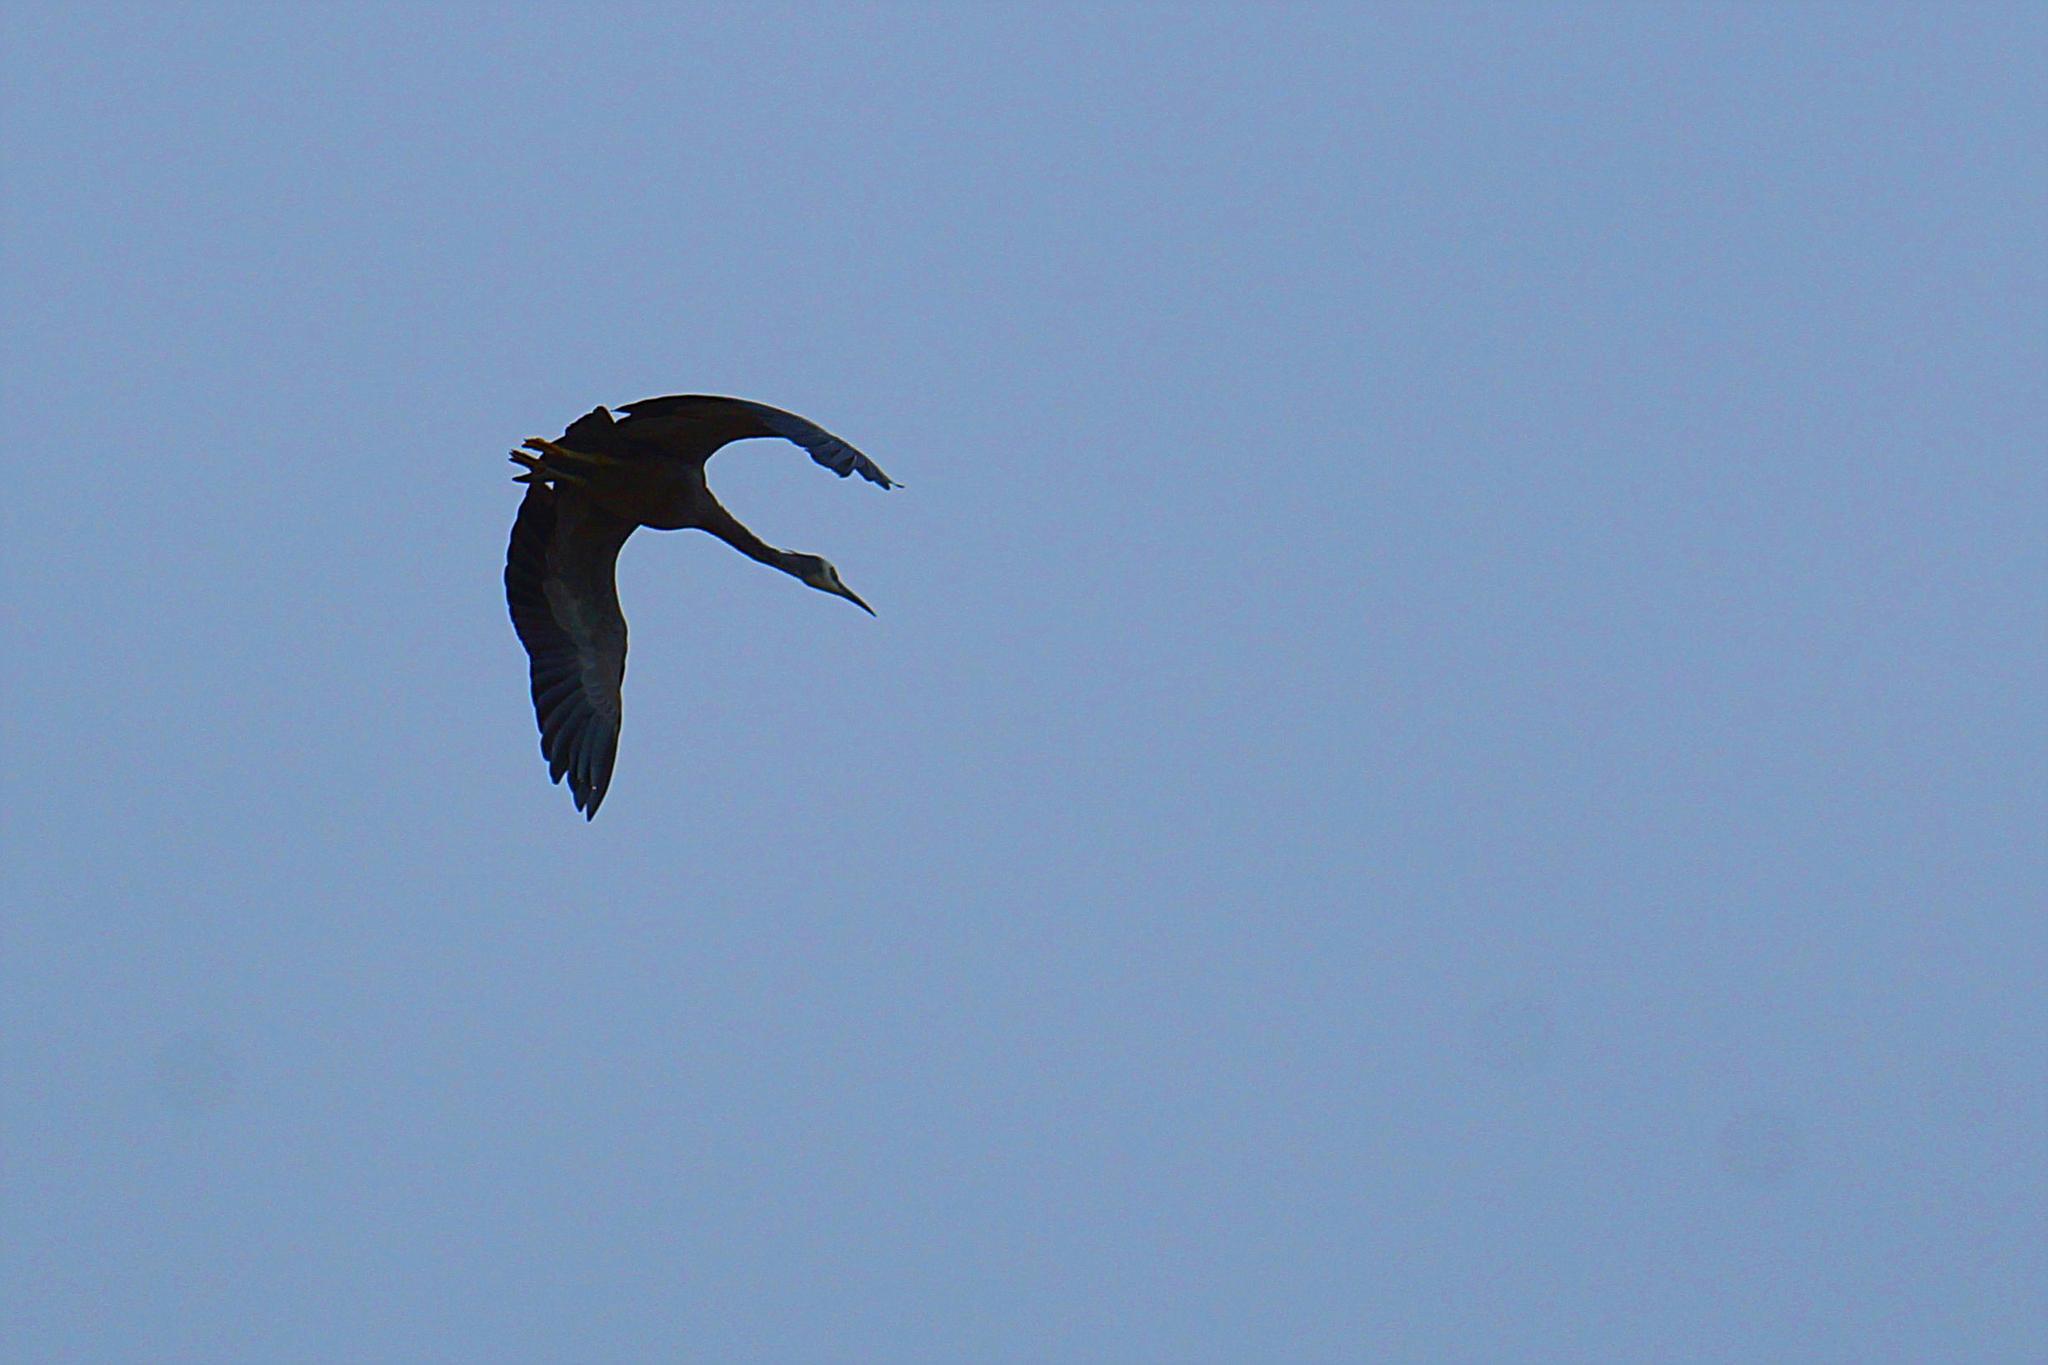 Bird silhouette  by Peter J Dwight